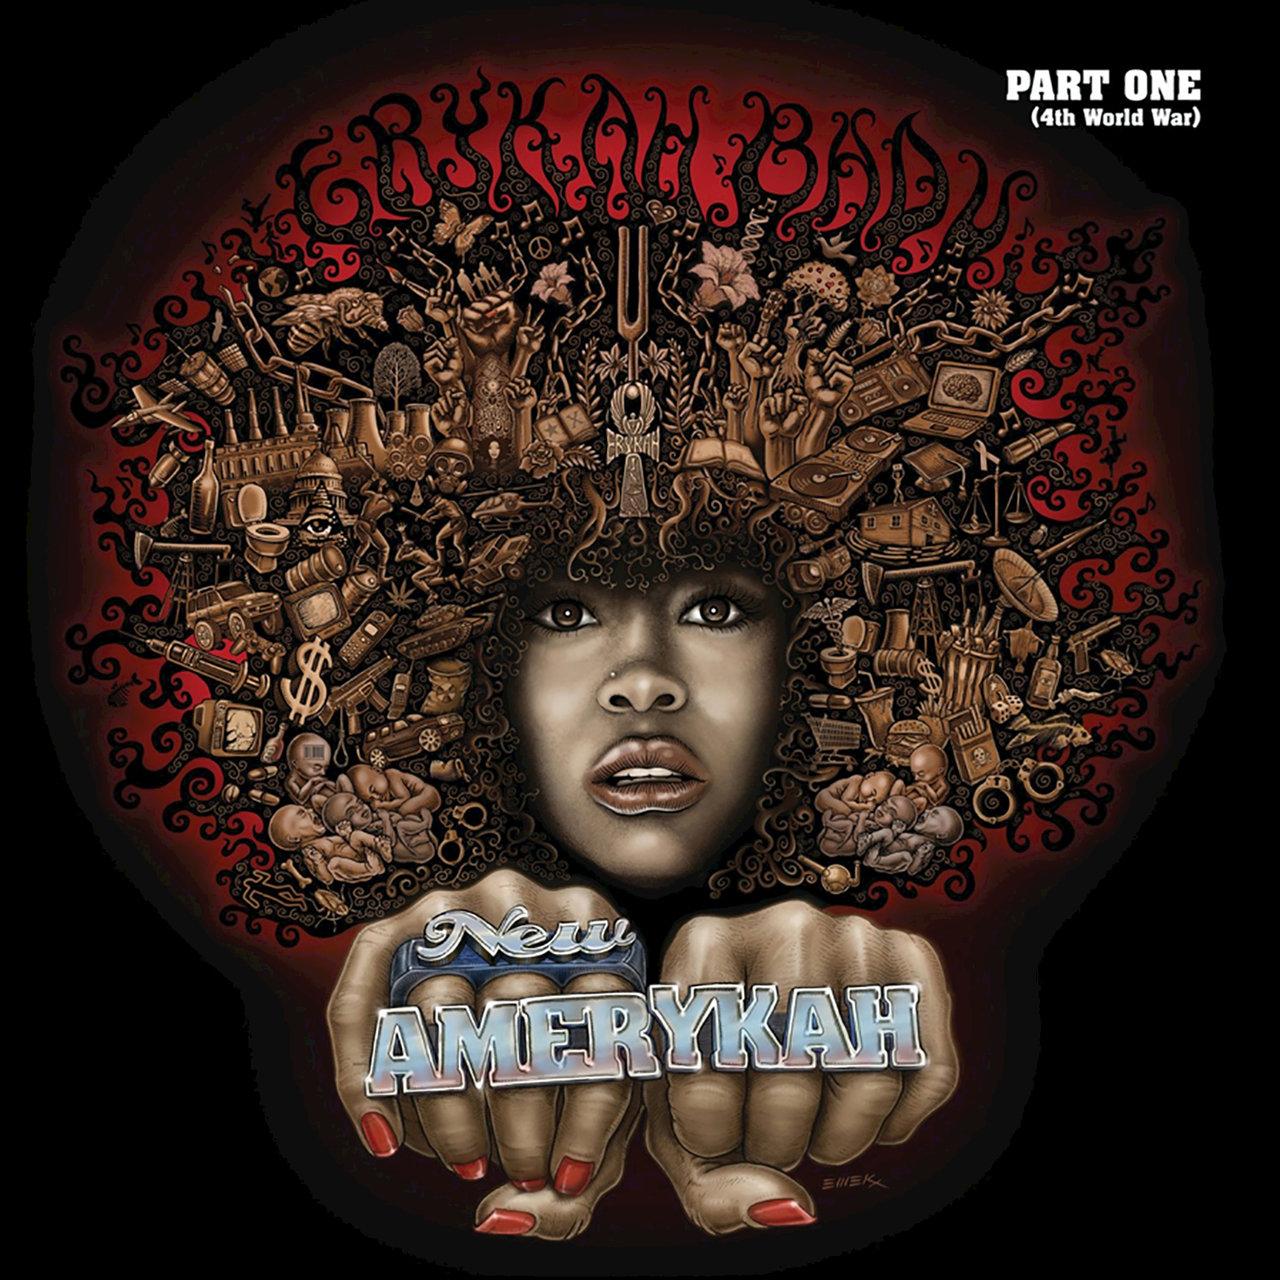 New Amerykah Part One (4th World War) - Erykah BaduMotownFevereiro/2008Neo SoulO que achamos: Muito Bom